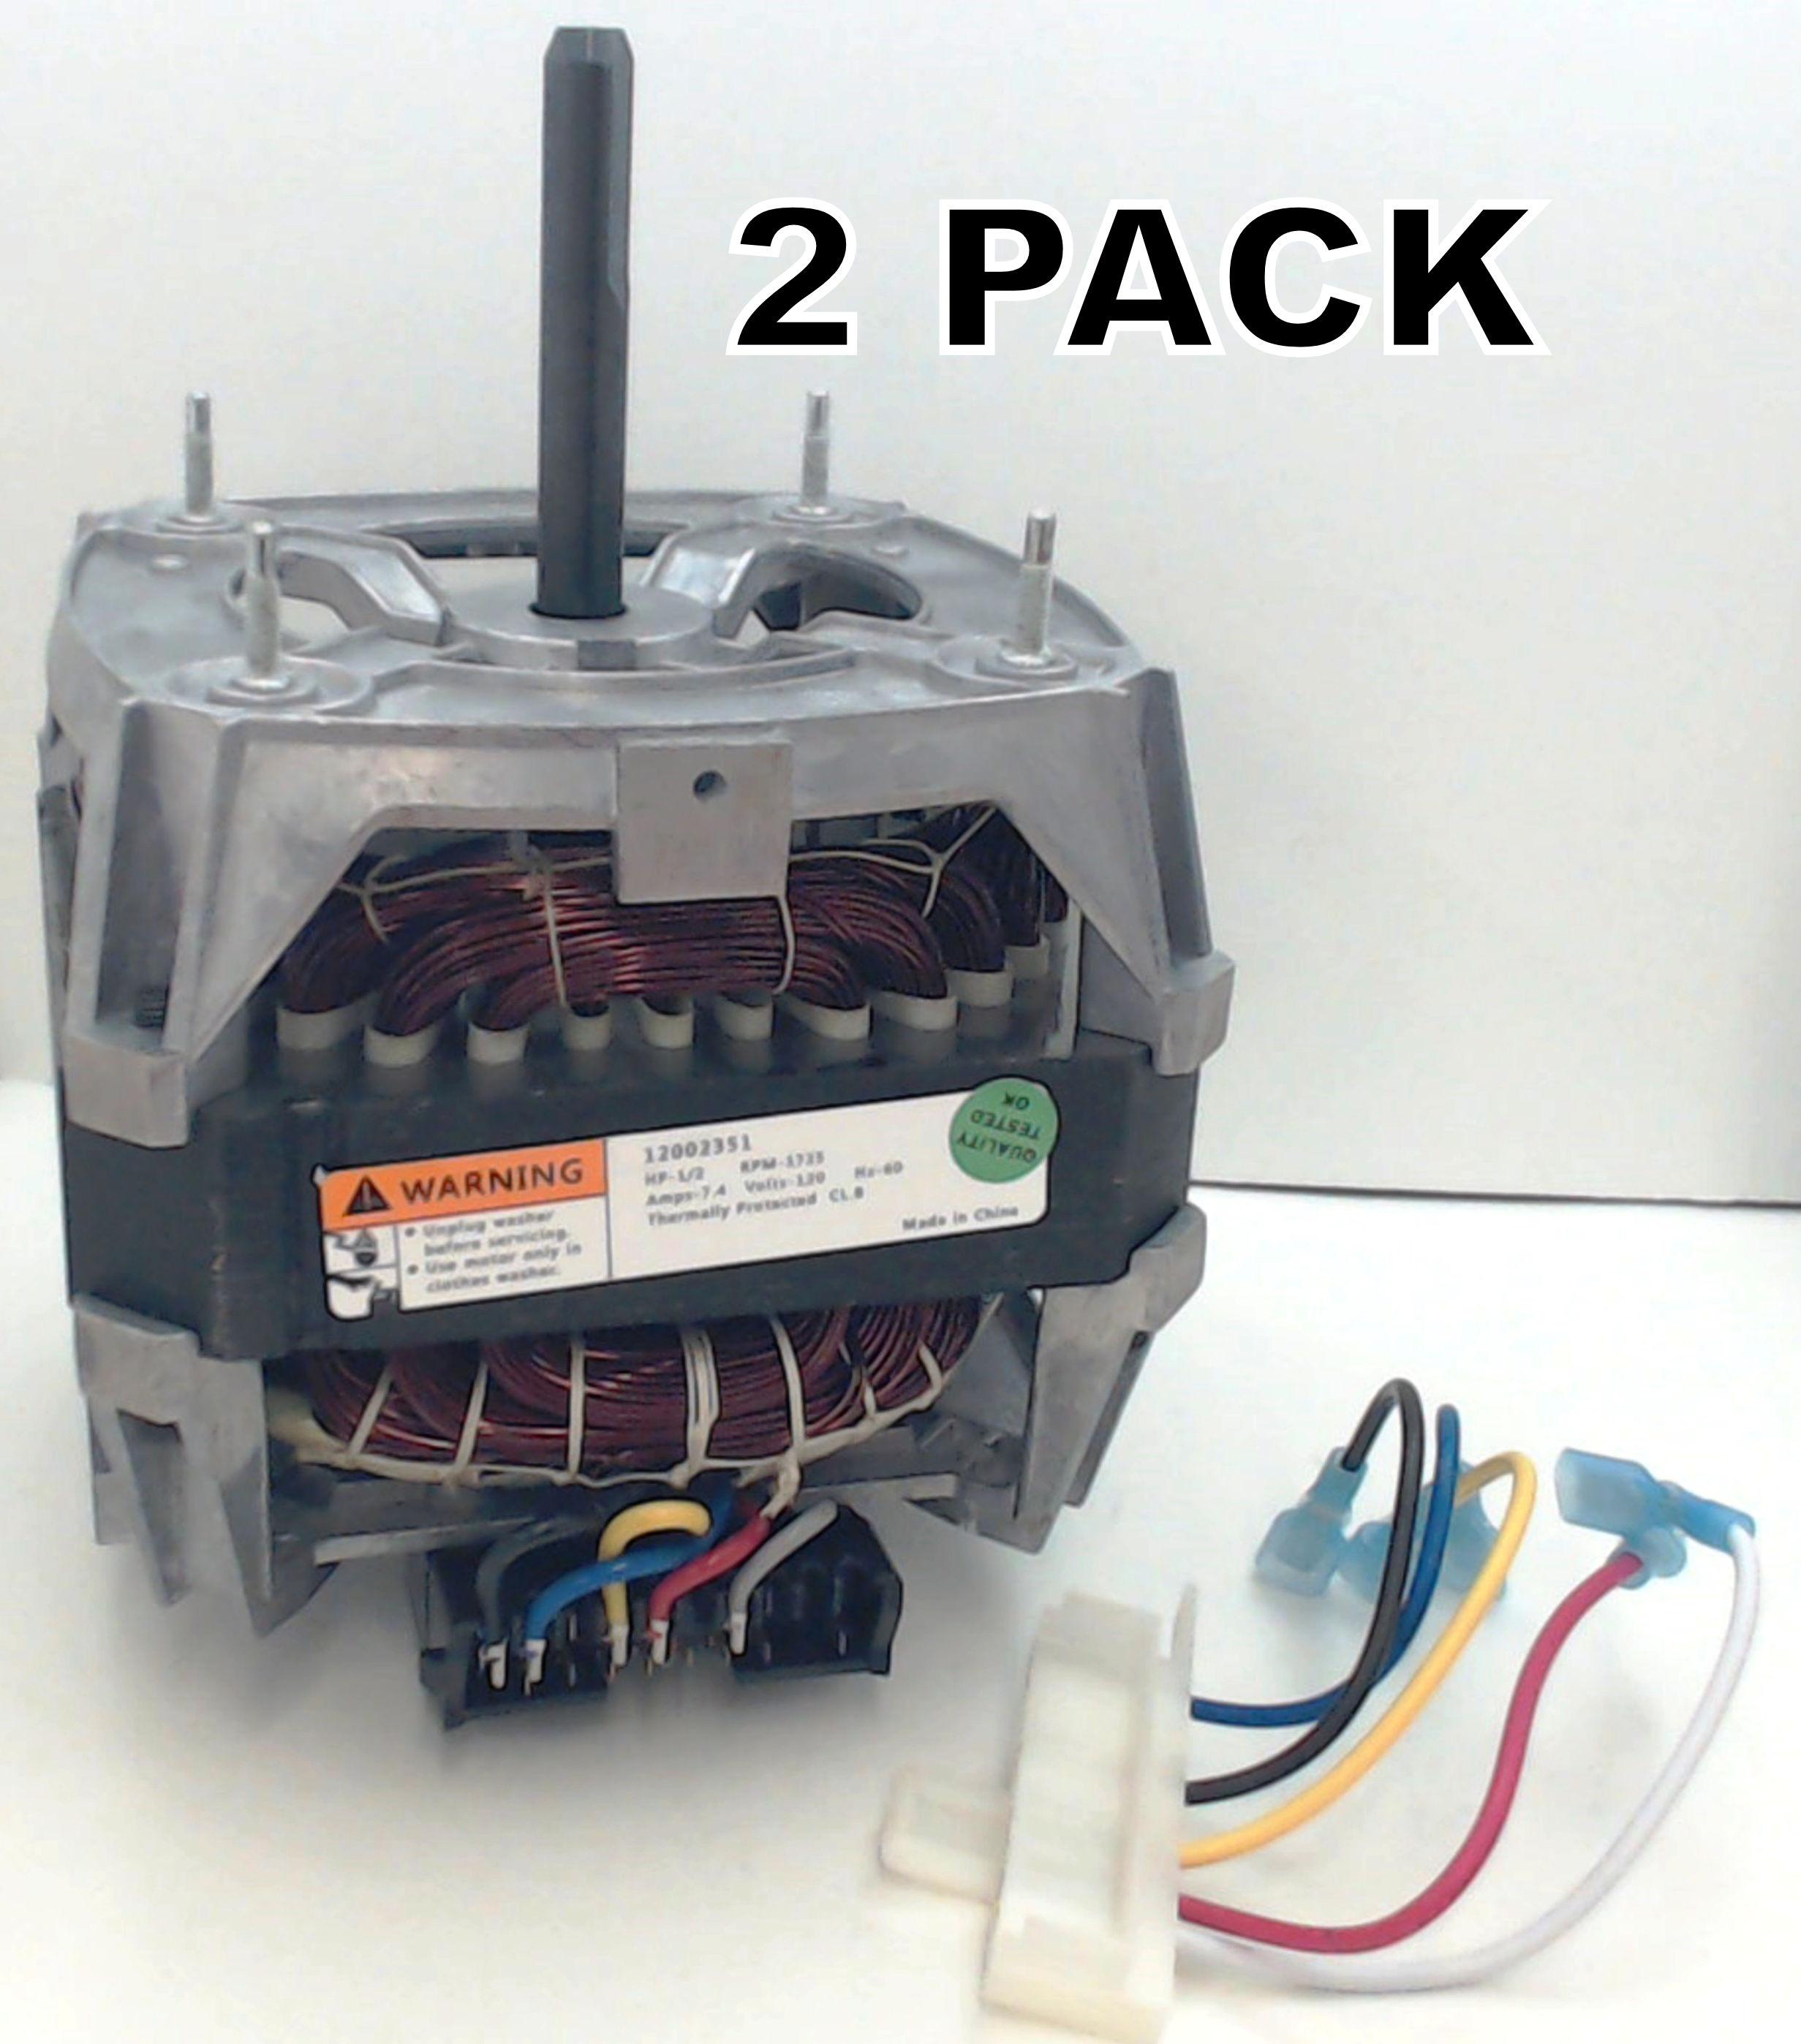 WP661600 PS11743427 Washing Machine Motor for Whirlpool AP6010250 389248